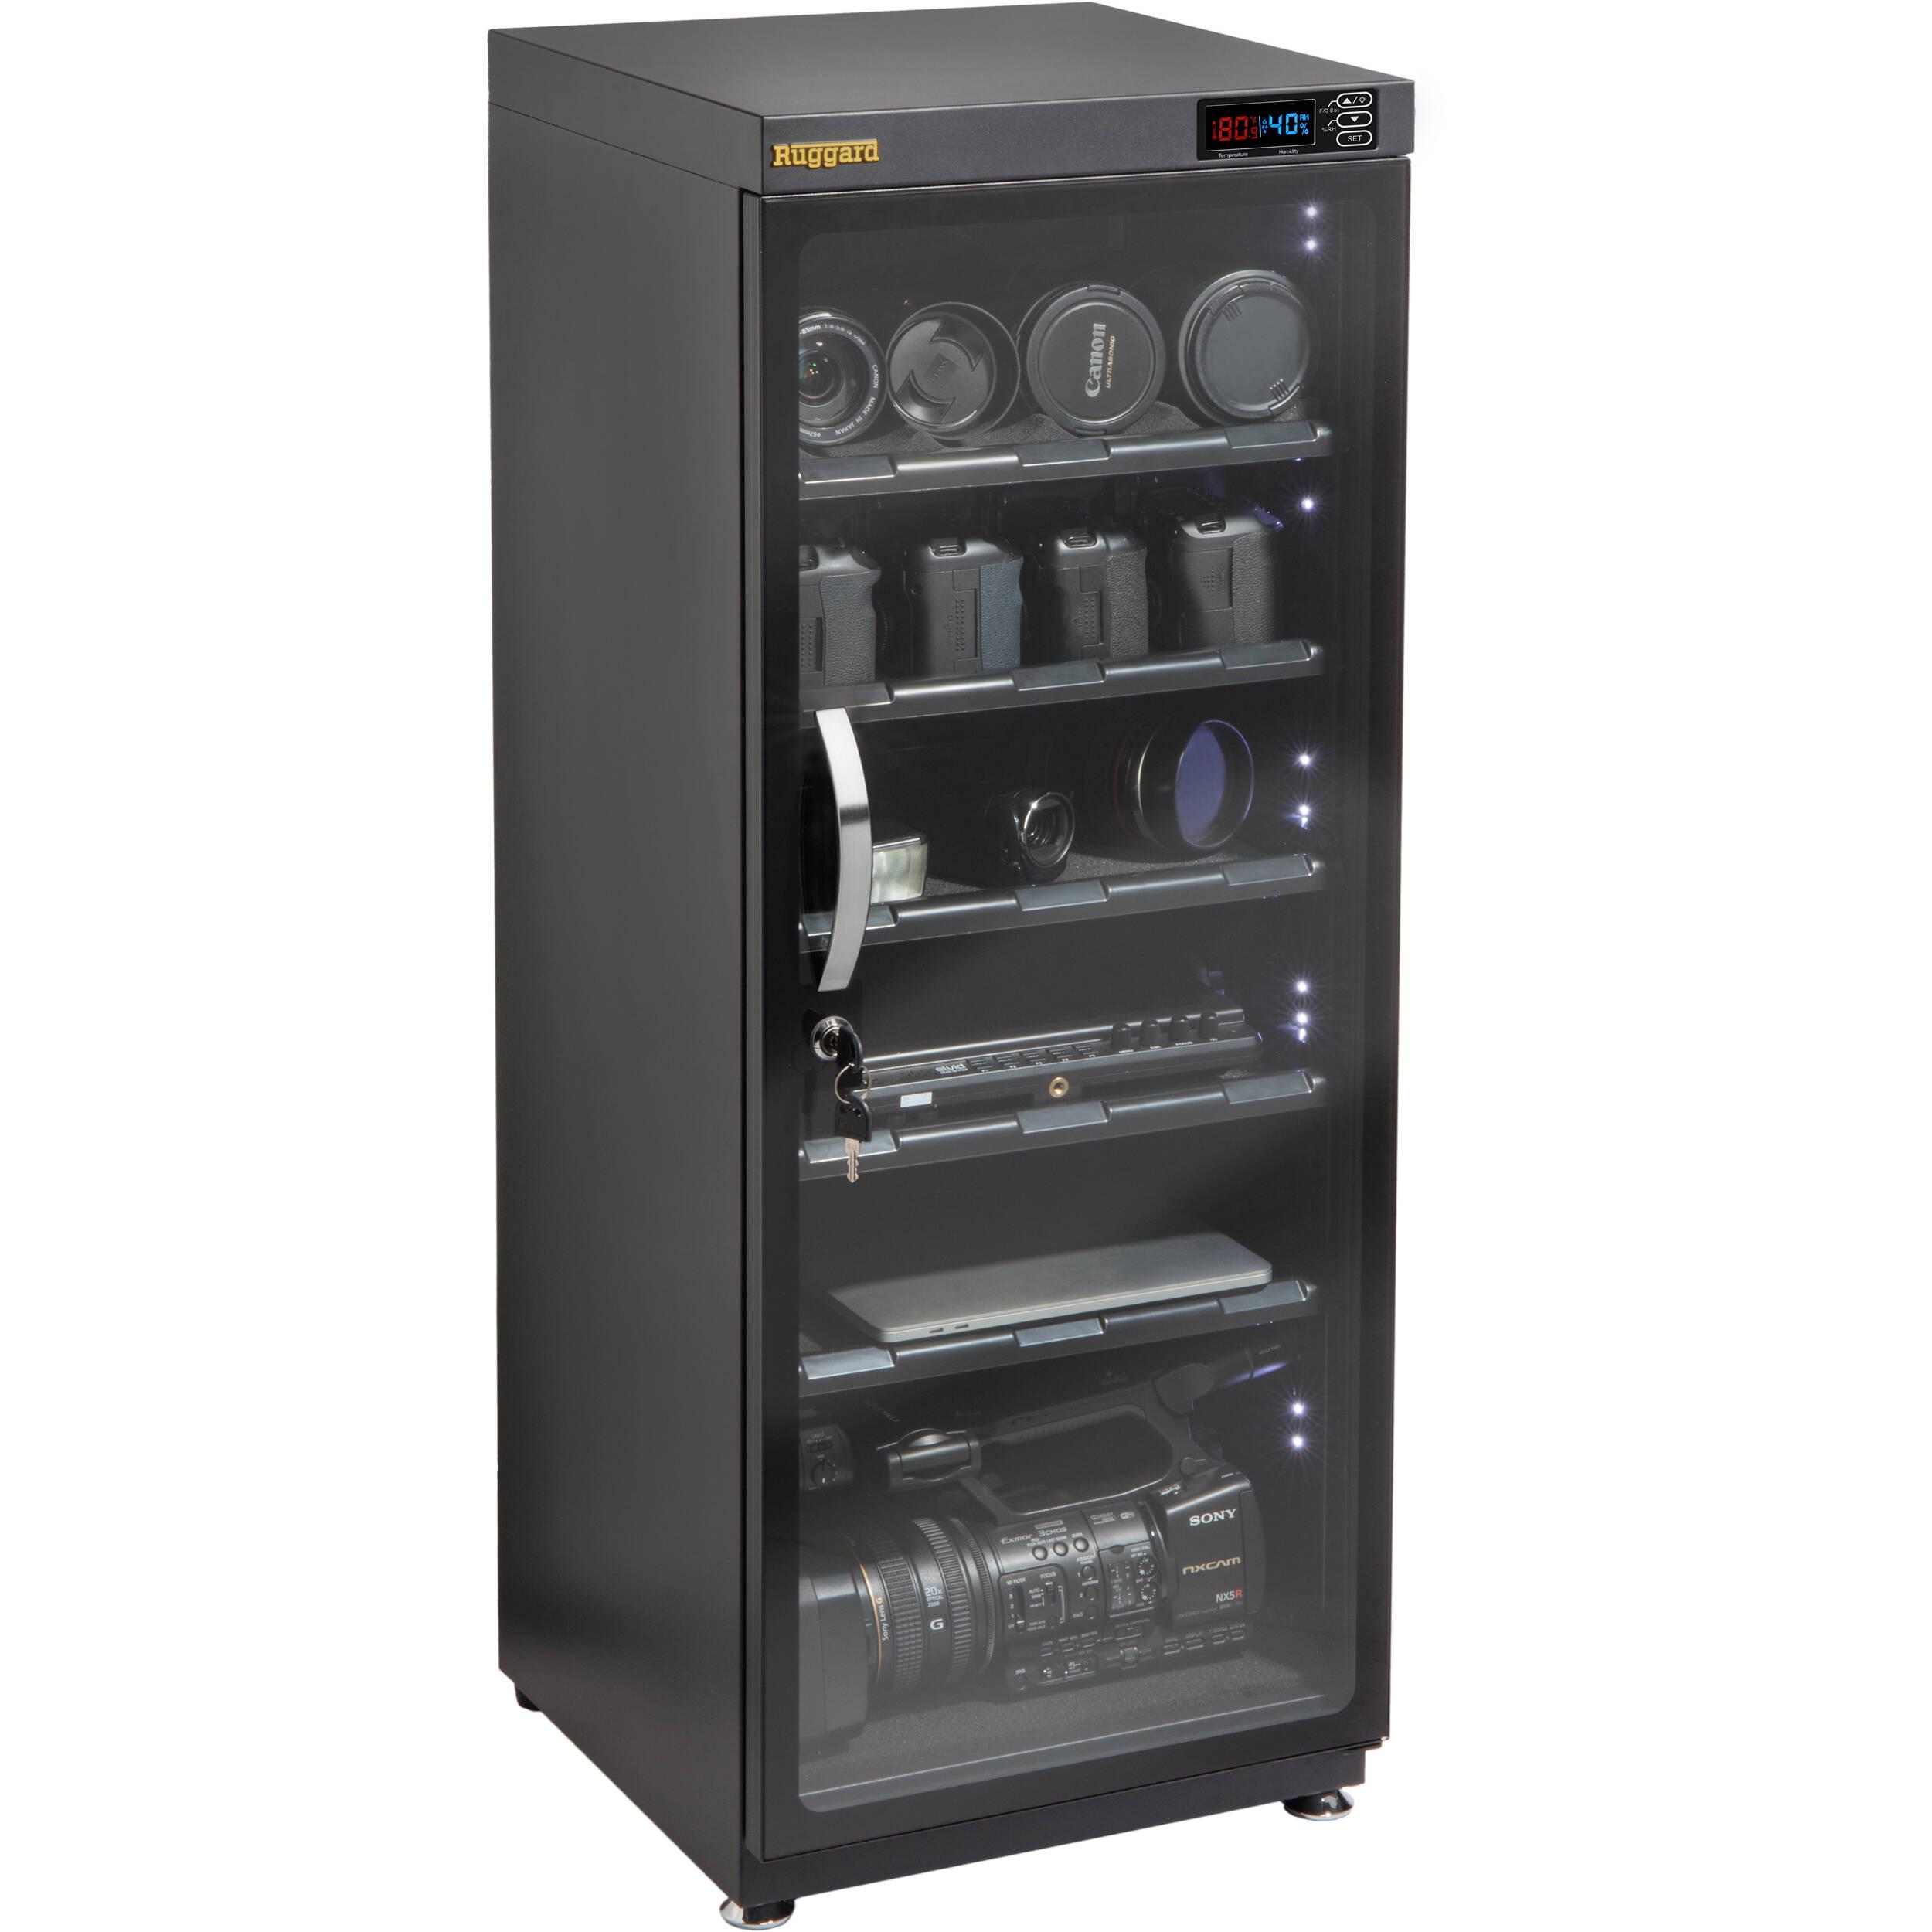 ruggard electronic dry cabinet (120l) edc-120l b&h photo video